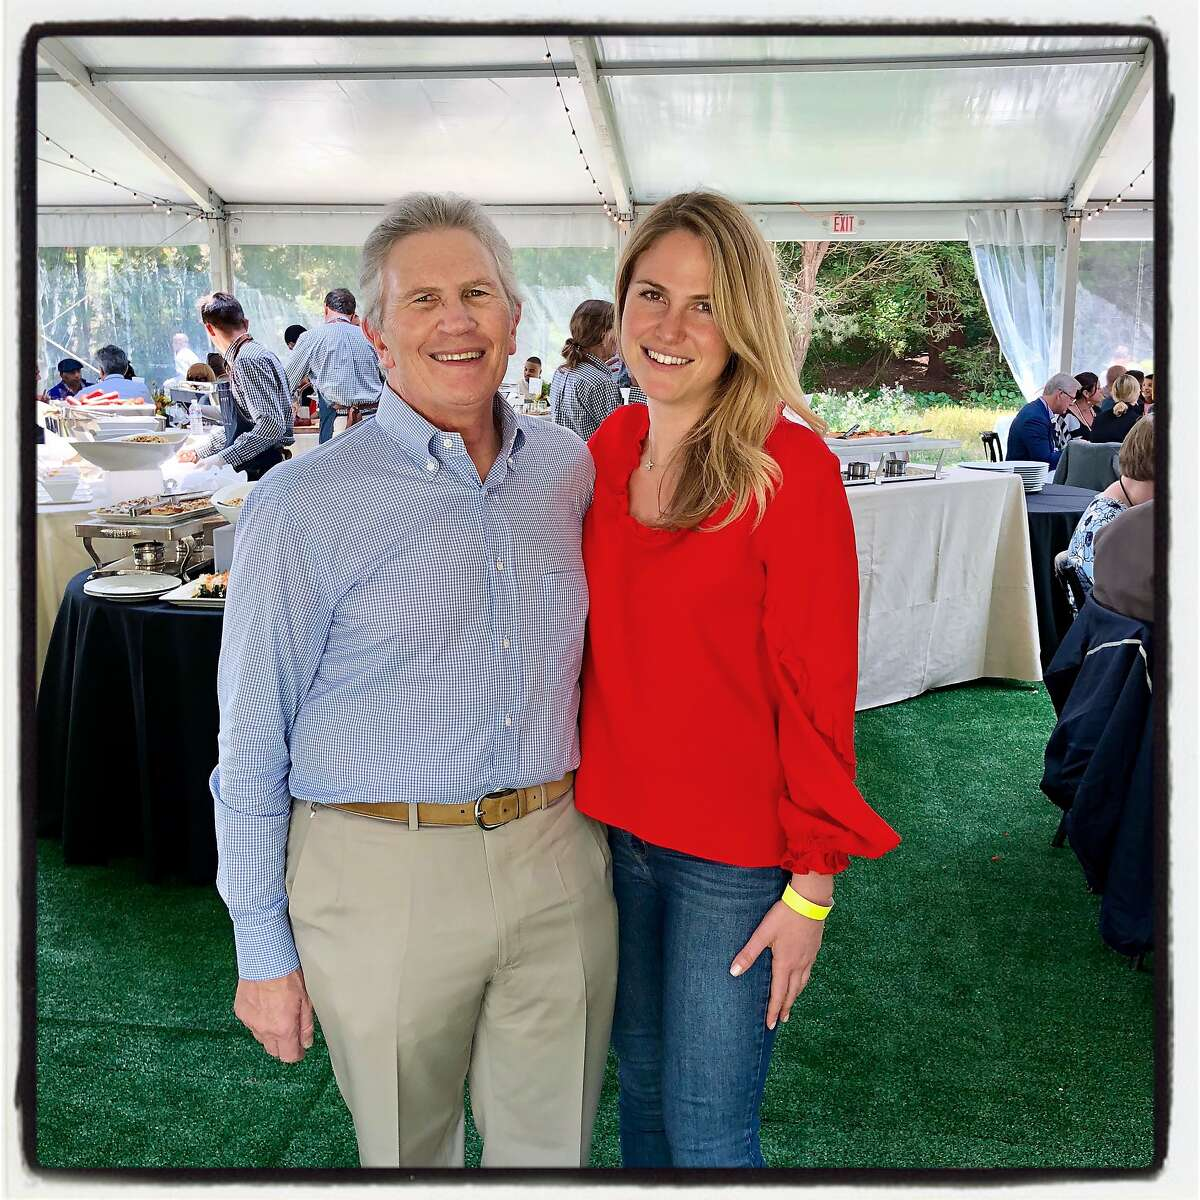 Stern Grove Festival board chairman Doug Goldman and his daughter, Jennifer Goldman, at the Big Picnic. June 24, 2018.